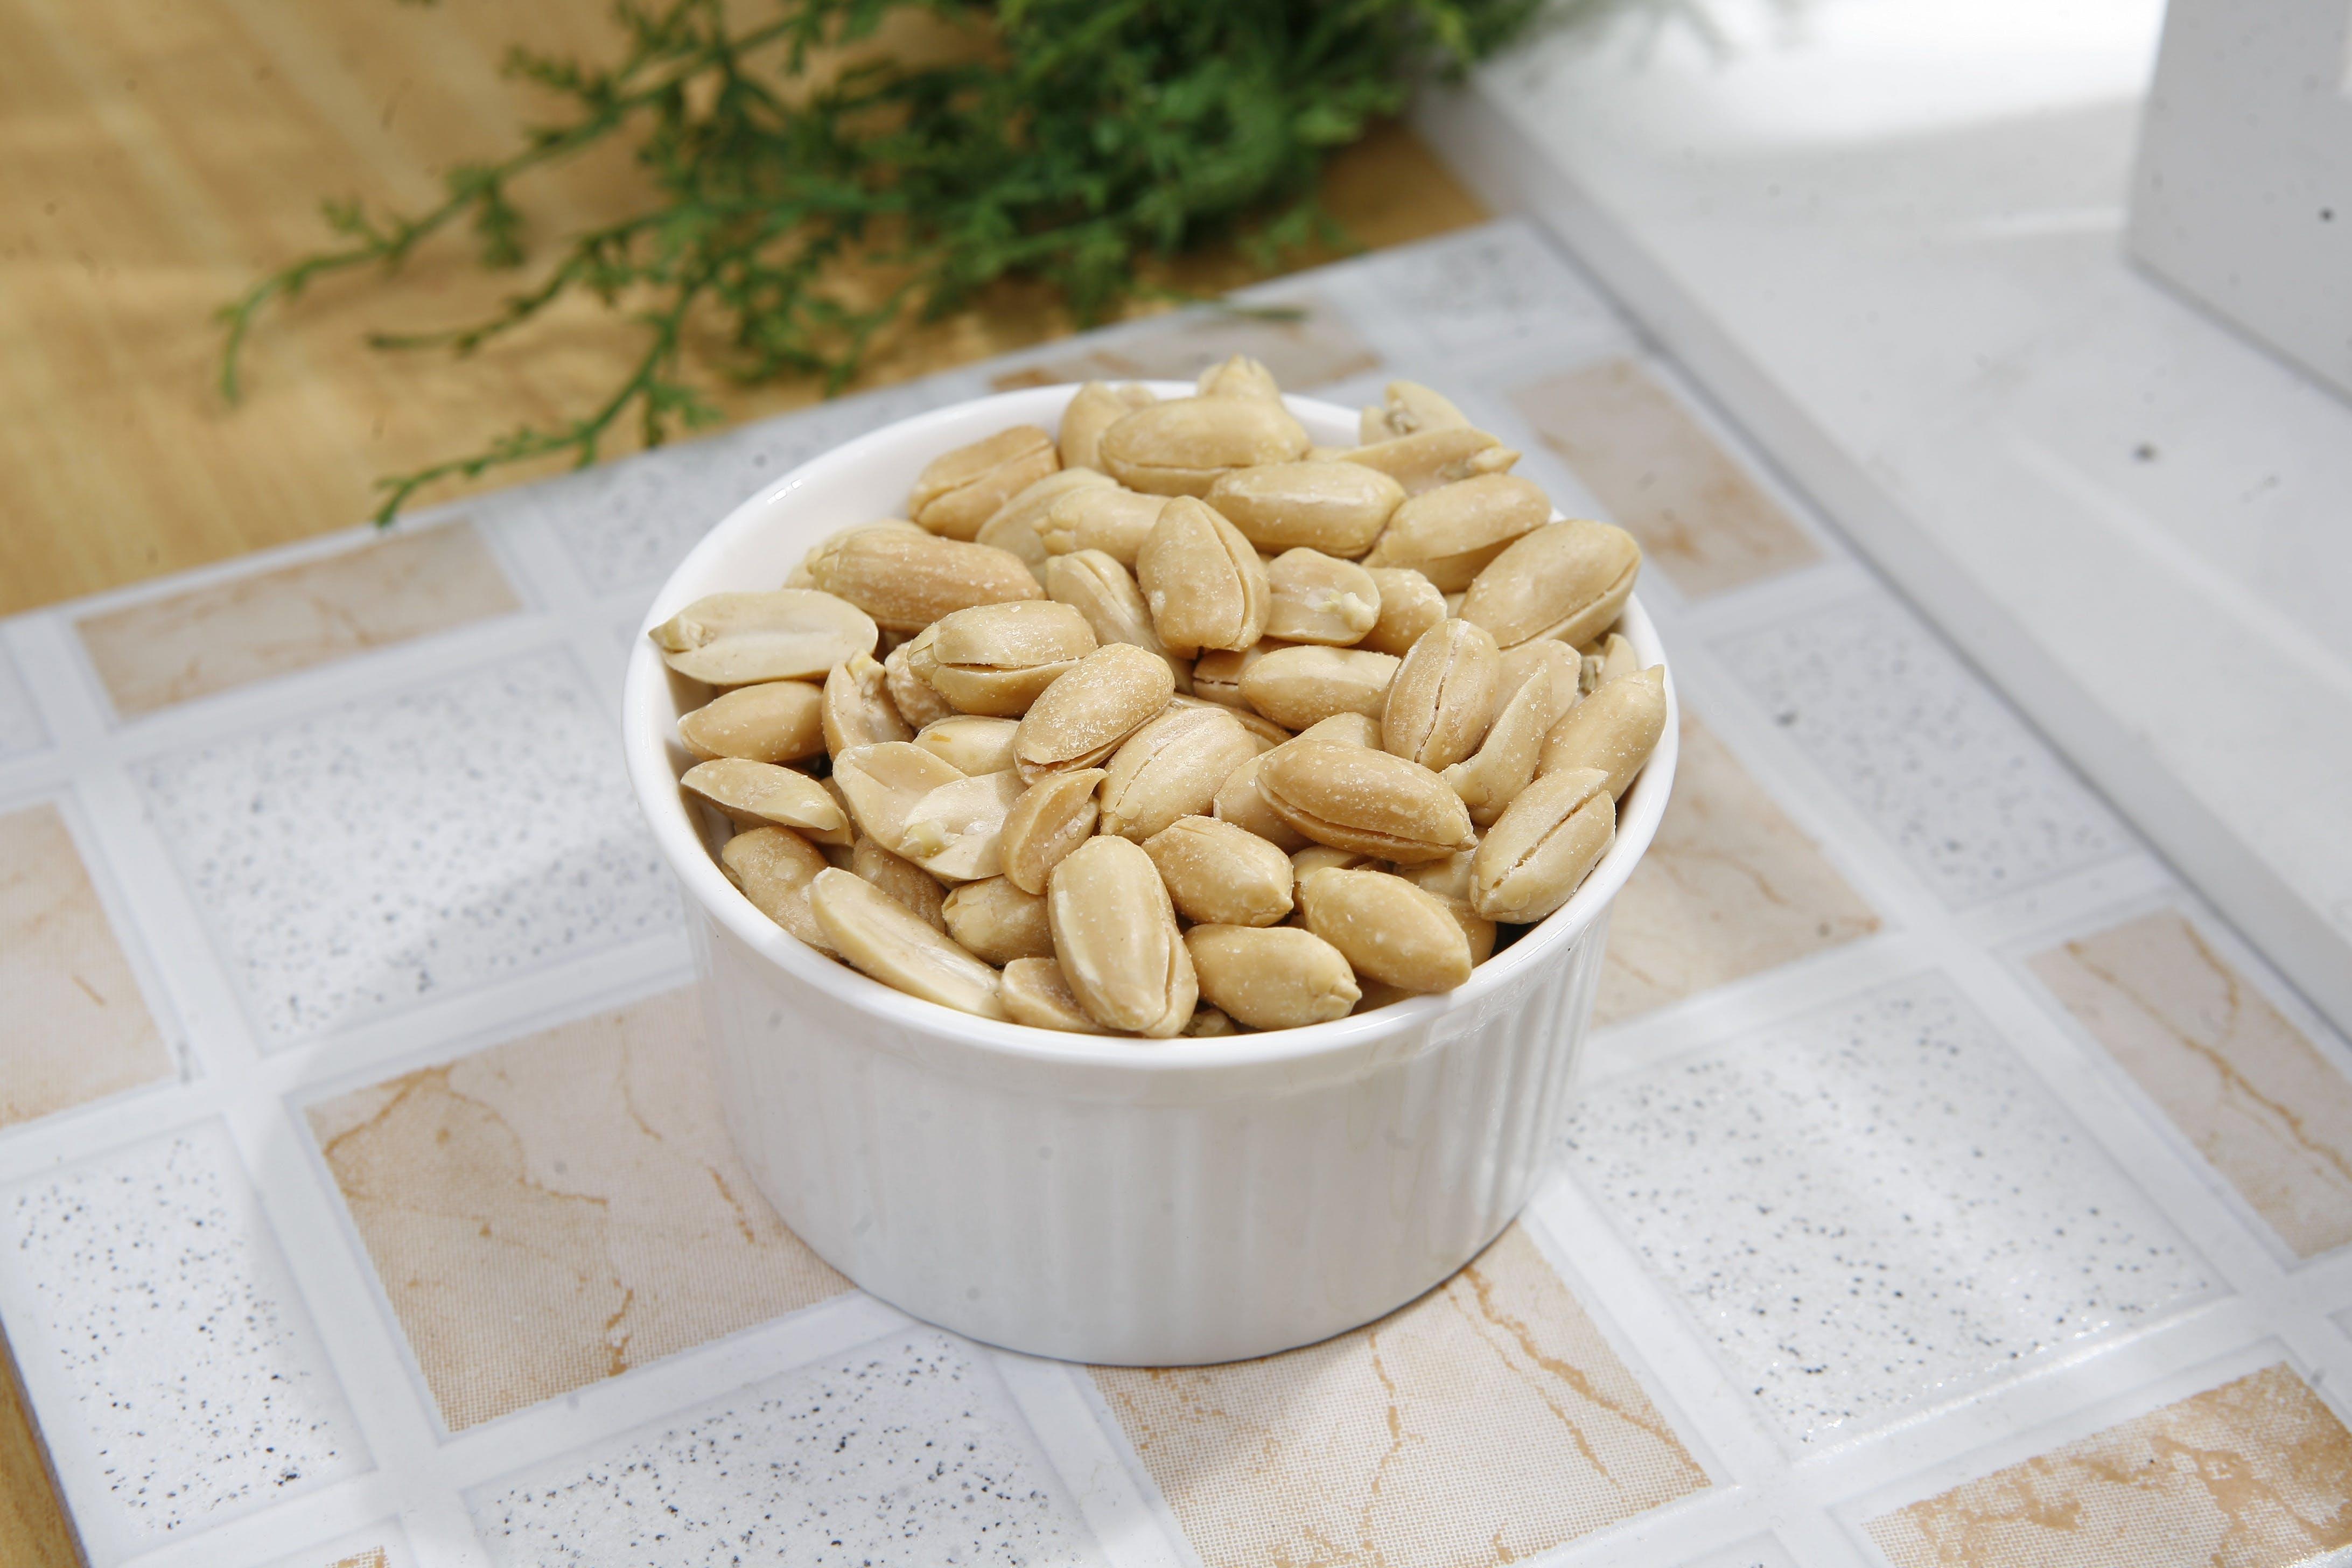 Peanuts in White Ceramic Bowl